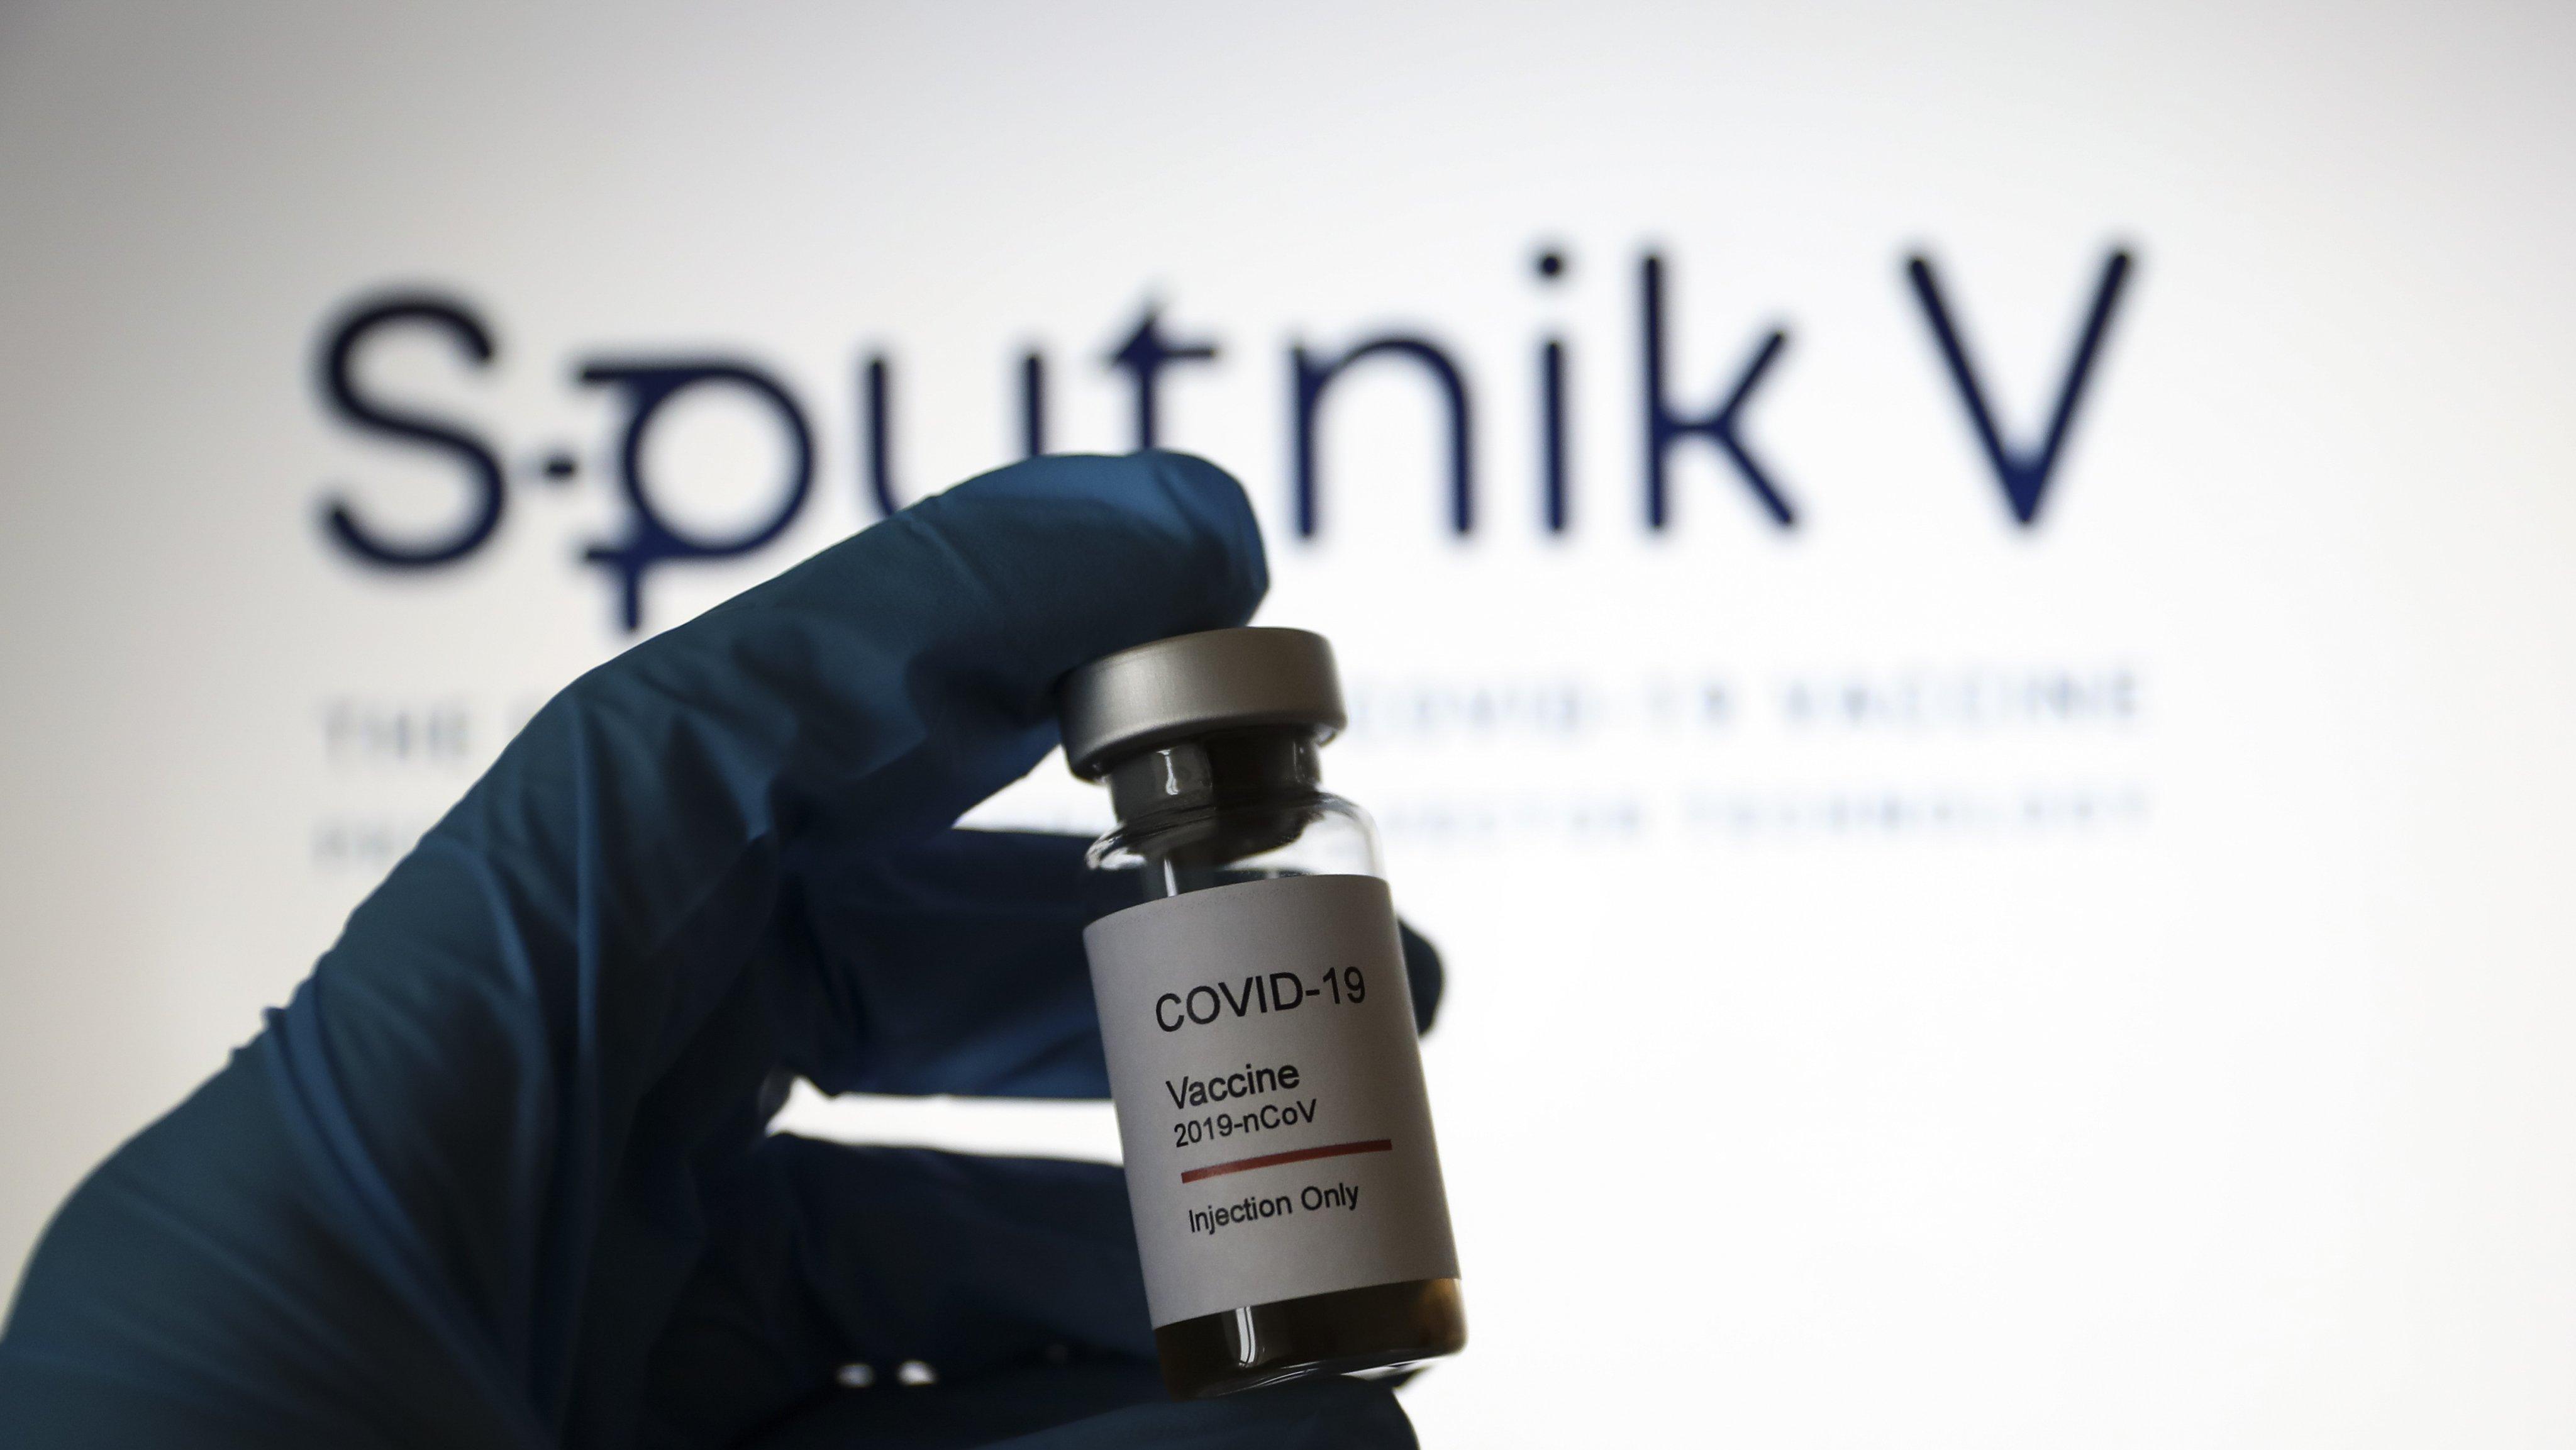 Companies working on COVID-19 vaccines